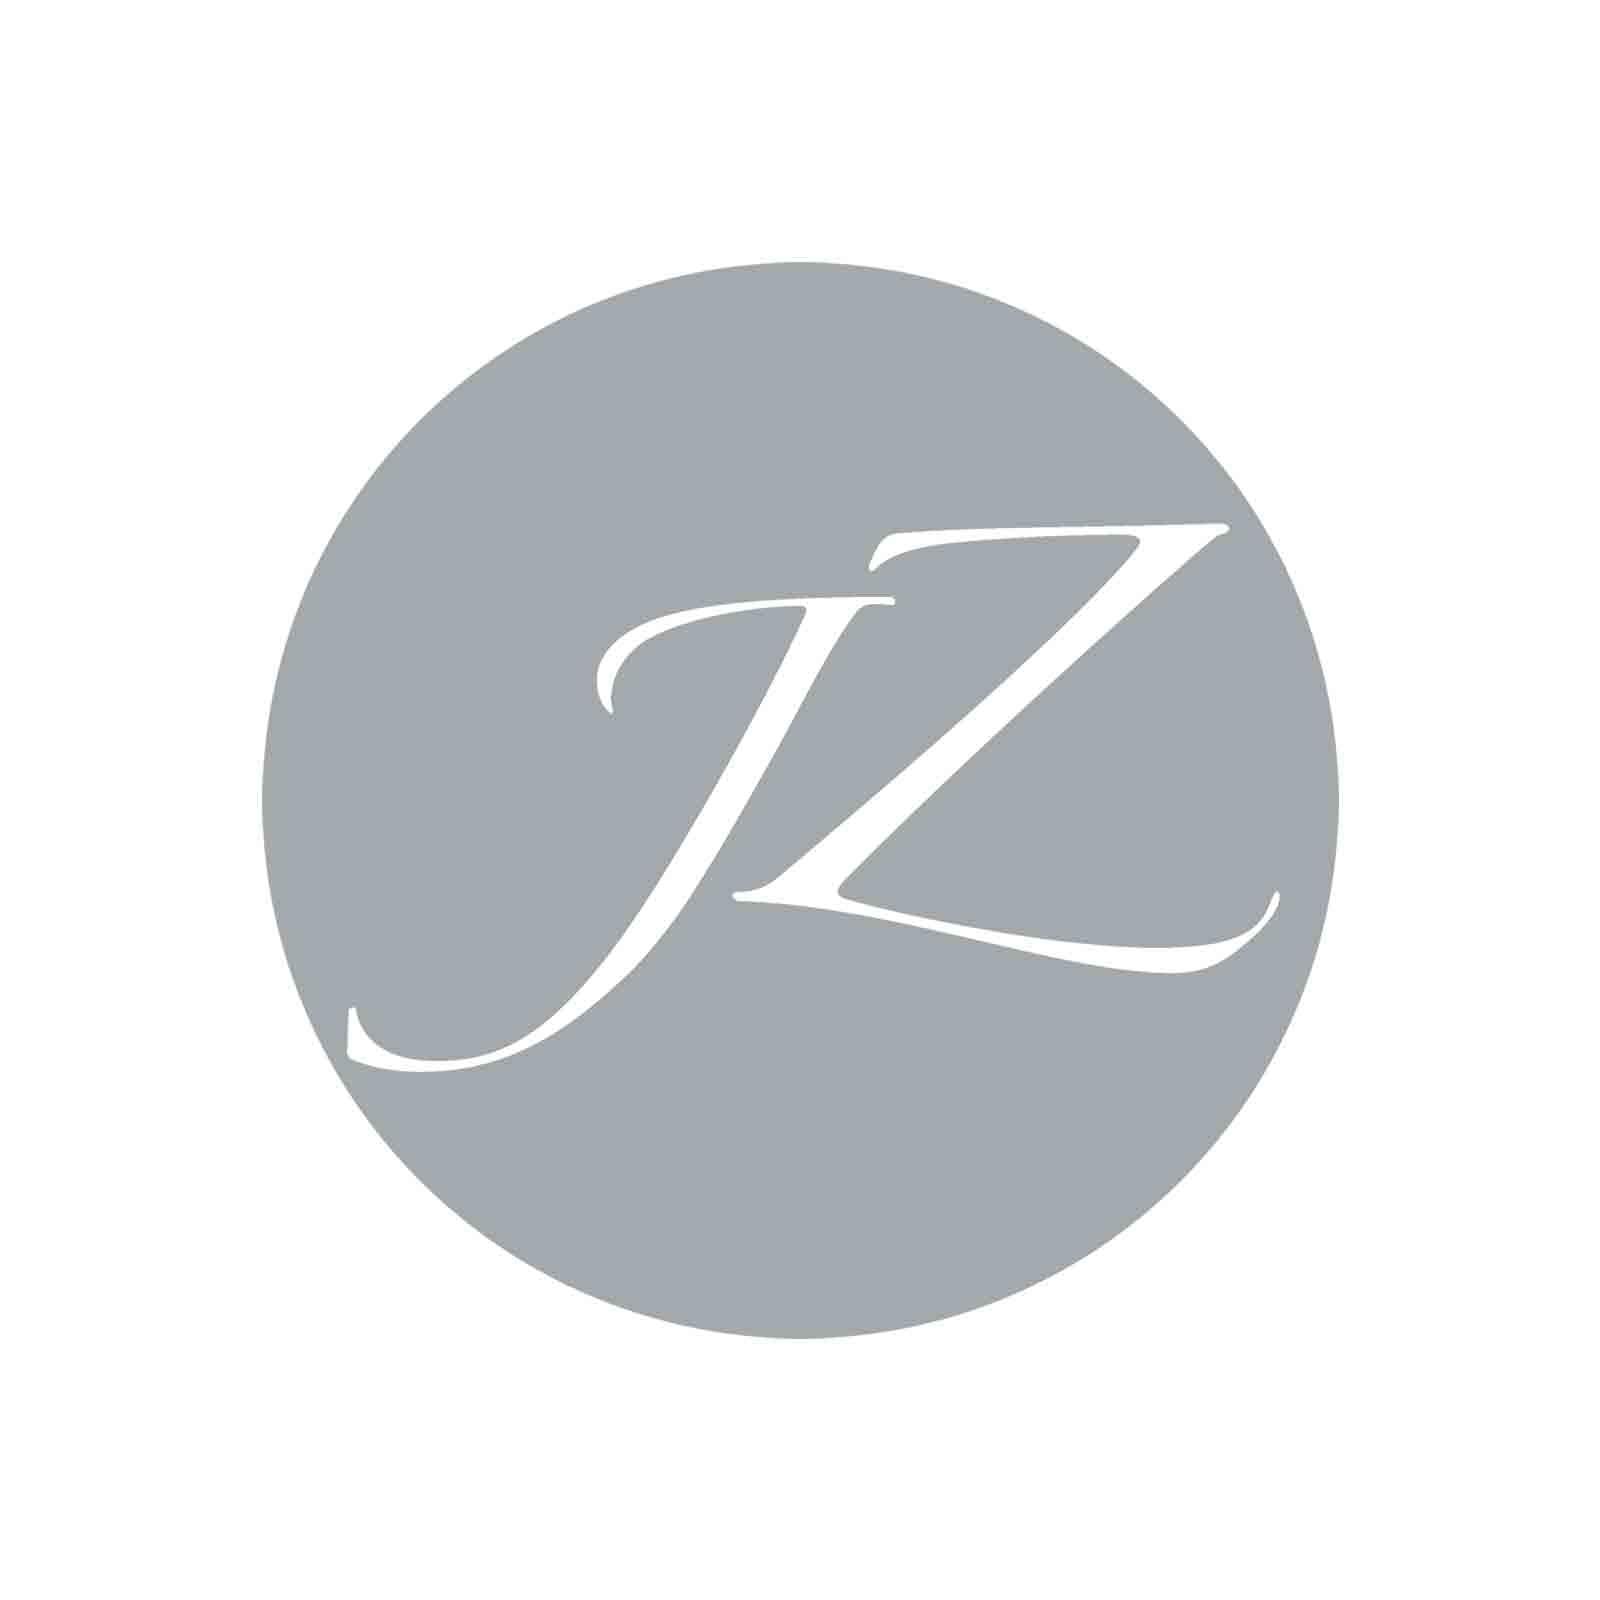 Kosmetik Institut Jeannette Zeugin Webagentur Basel Internetagentur Homepage ShowMyProject Basel